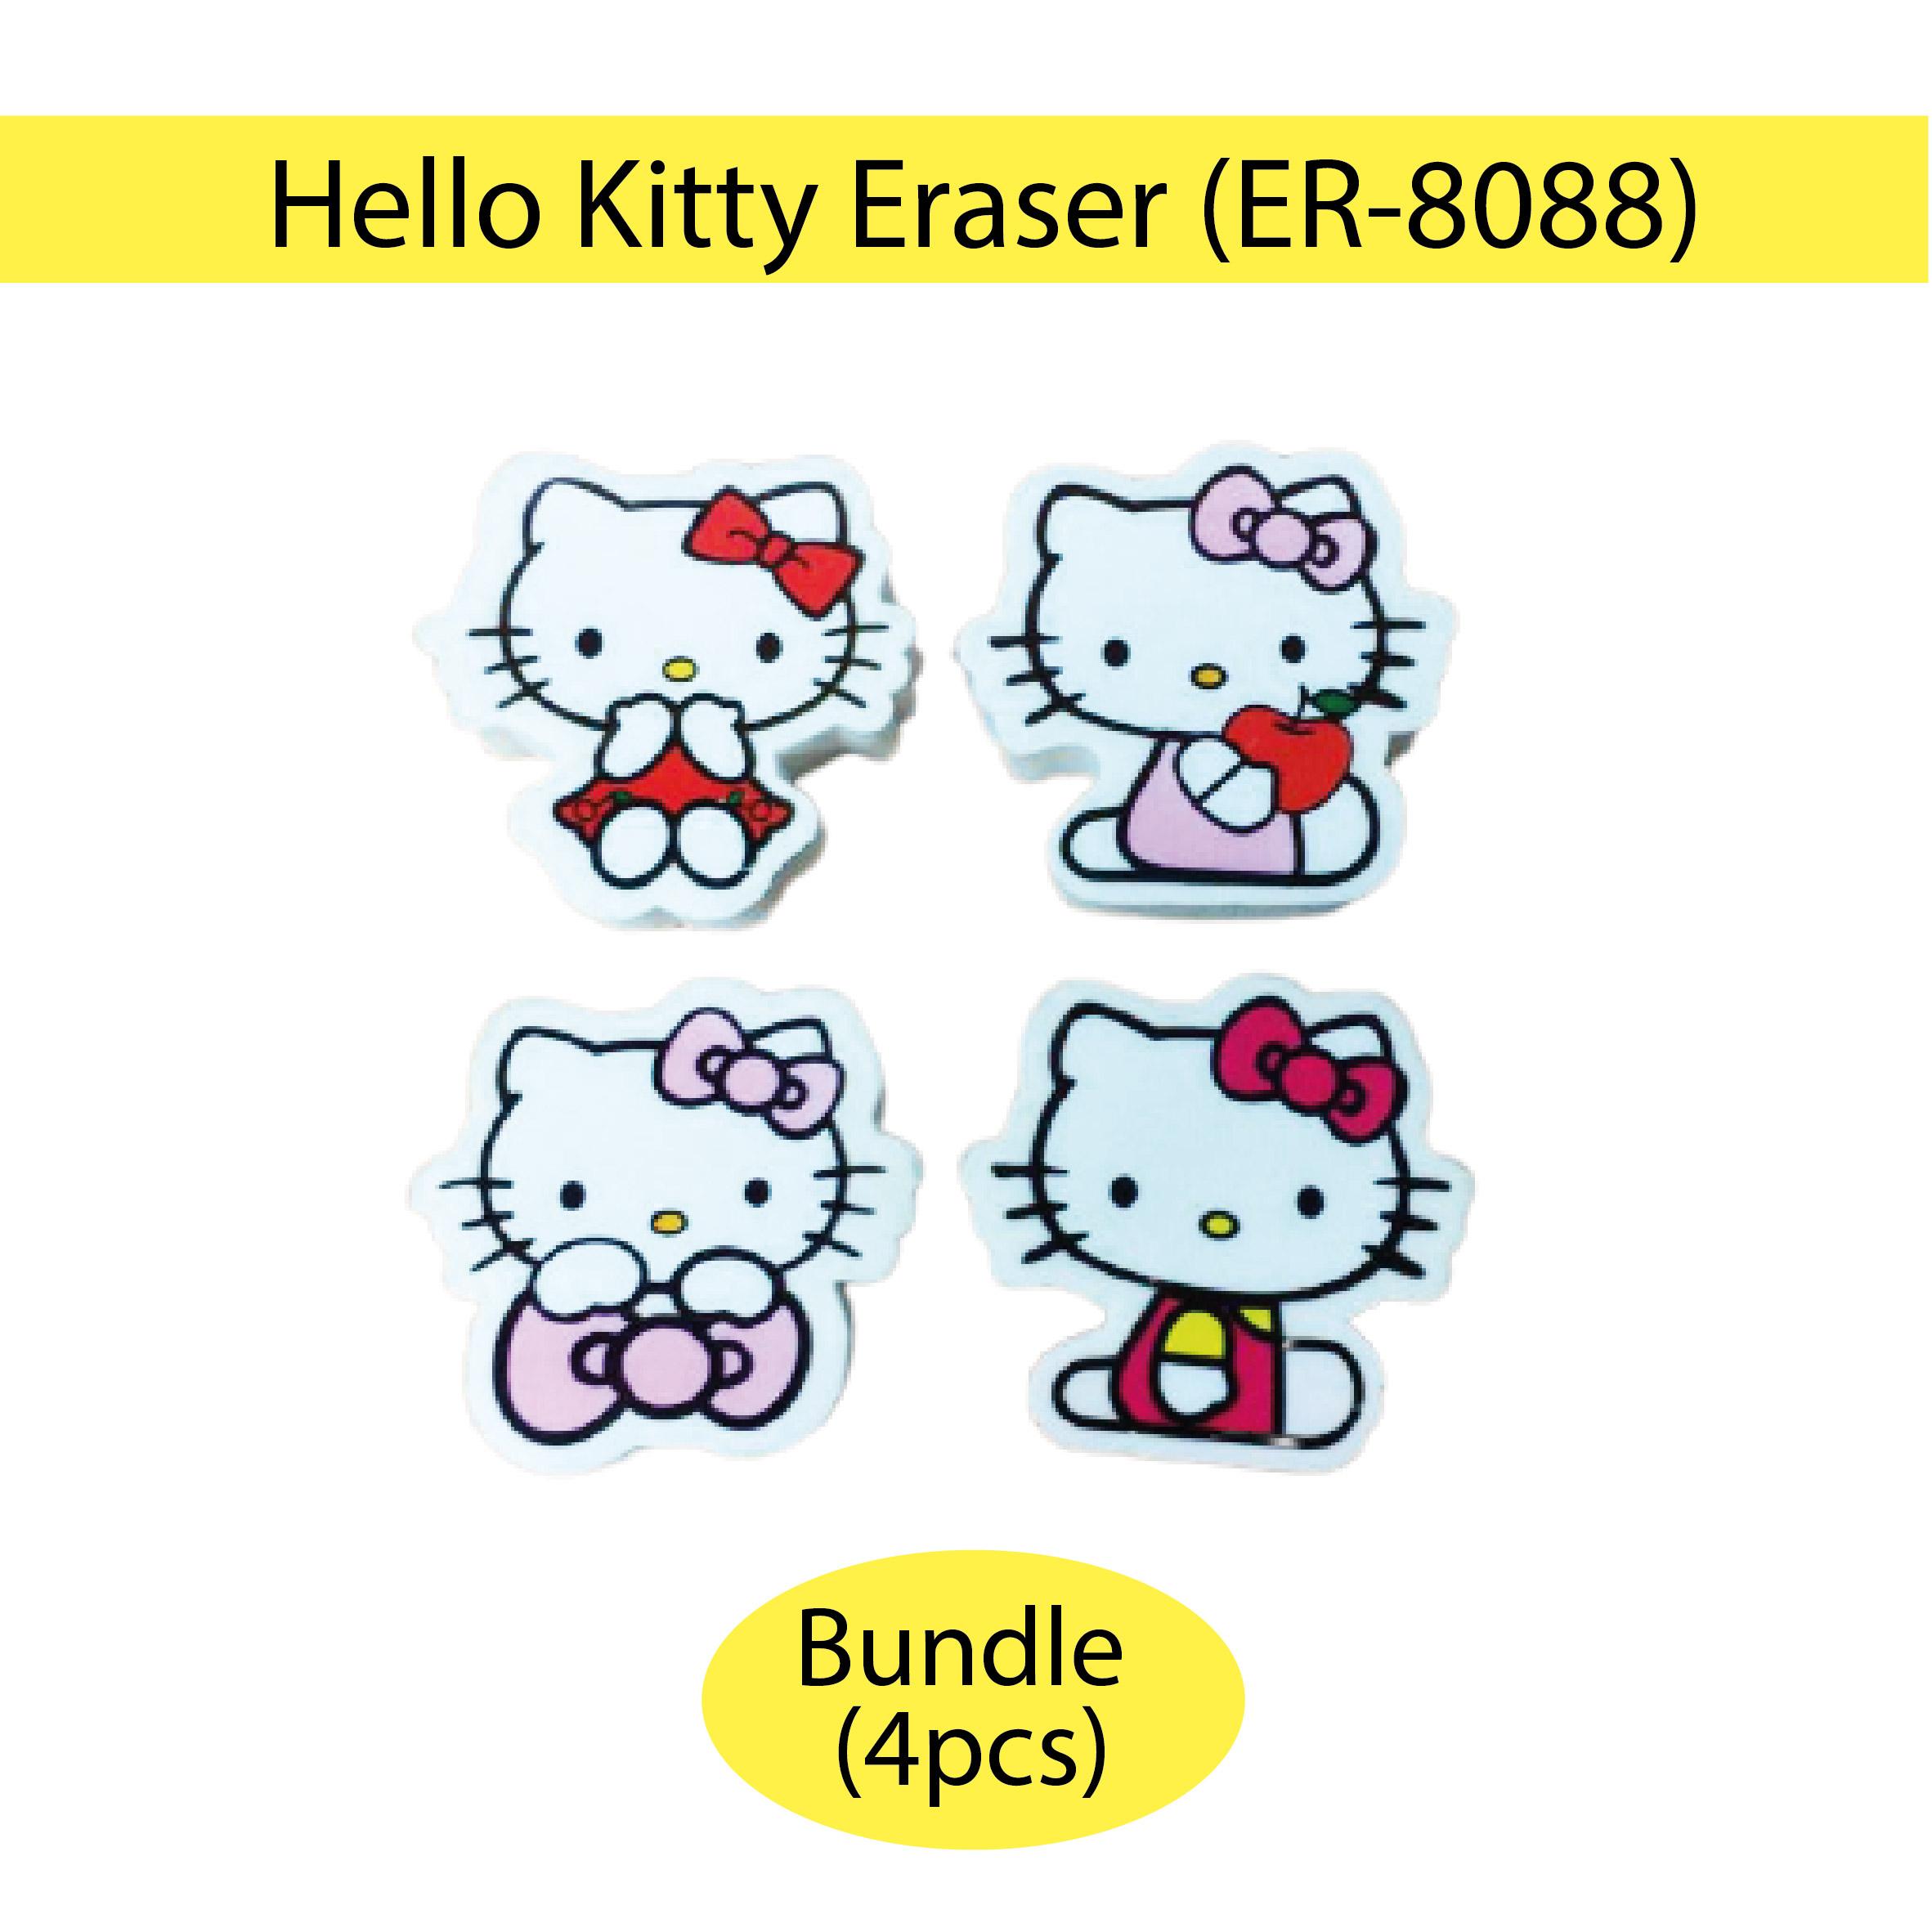 Hello Kitty Eraser Bundle (4pcs)